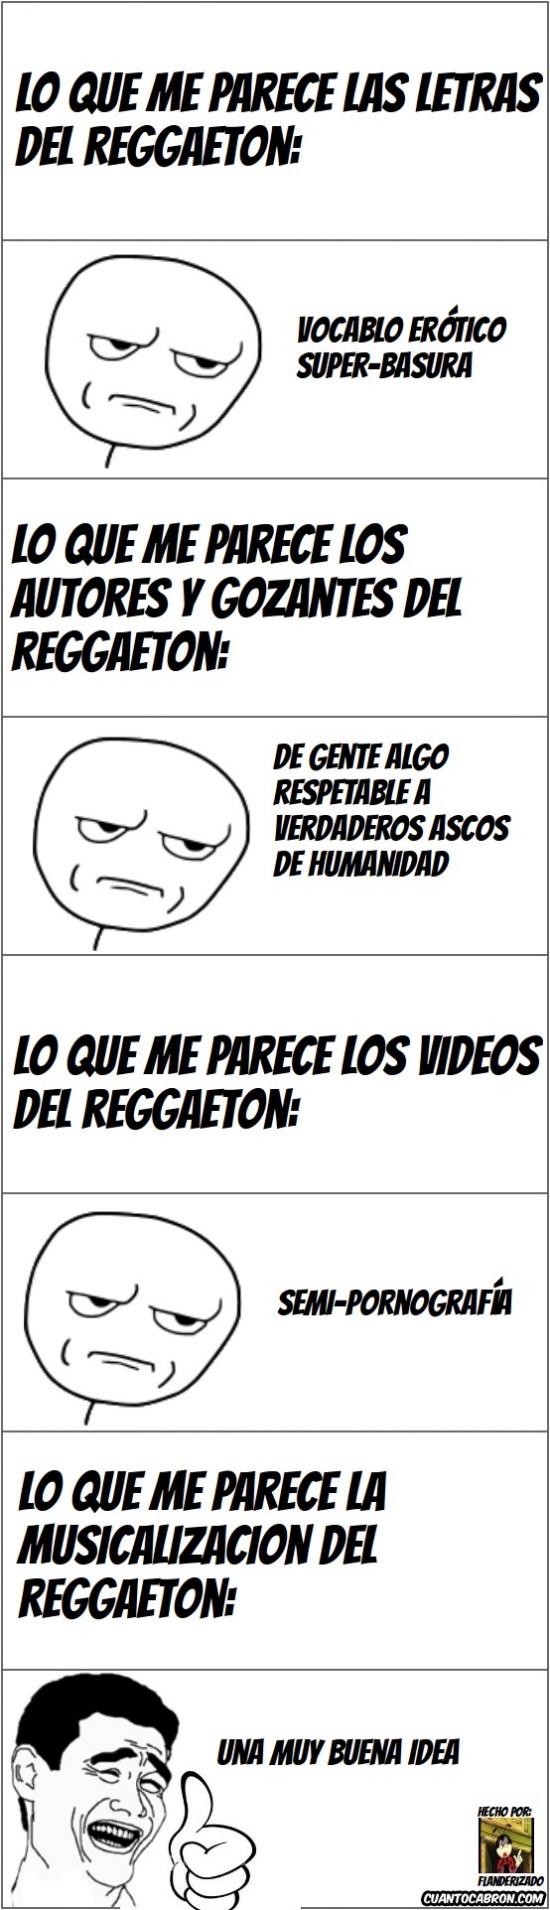 Kidding_me - Mi critica al reggaeton en 4 aspectos